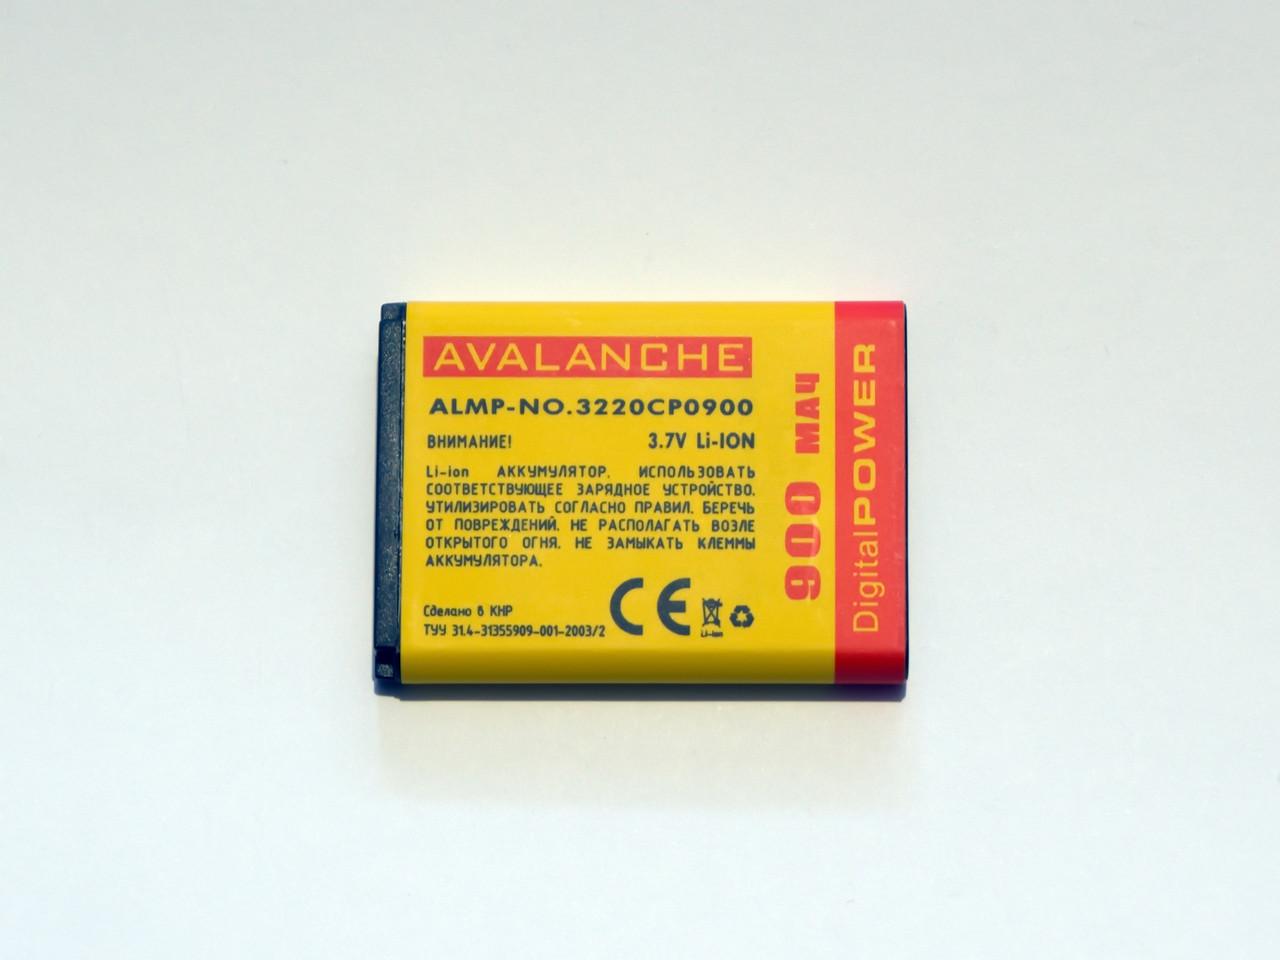 АКБ  Avalanche для Nokia 3220, 3230, 5140, 6020, 7260 (BL-5B) - 900 мАч